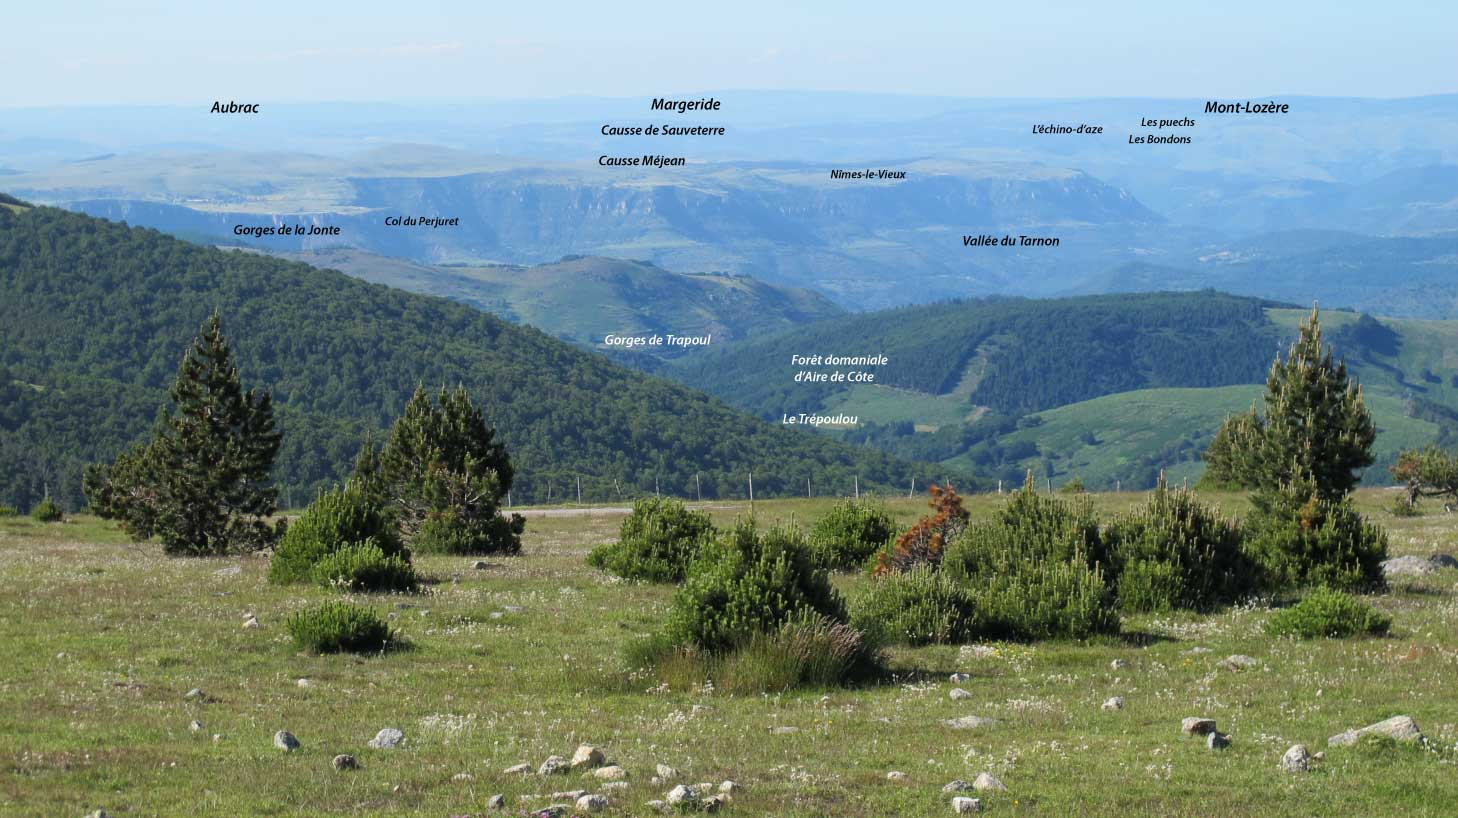 Panorama vu de l'Aigoual vers le nord vers le causse Méjean